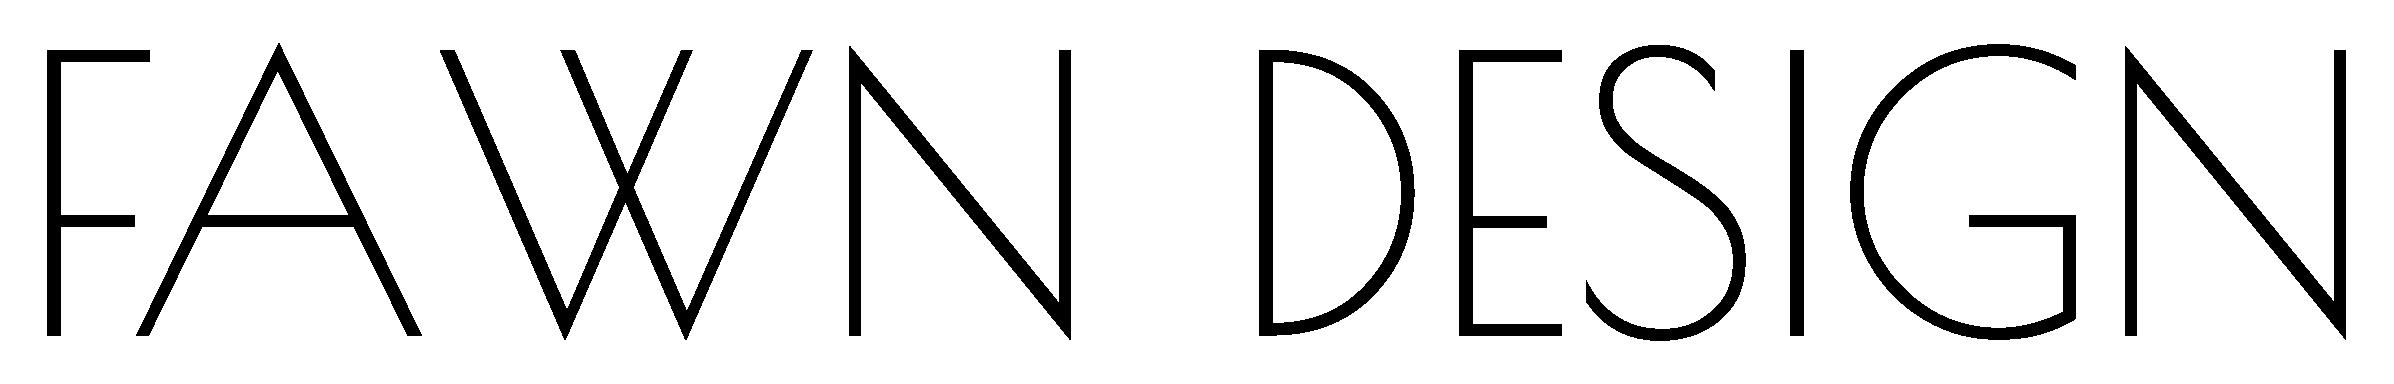 Fawn_Logo-01_2394x.png